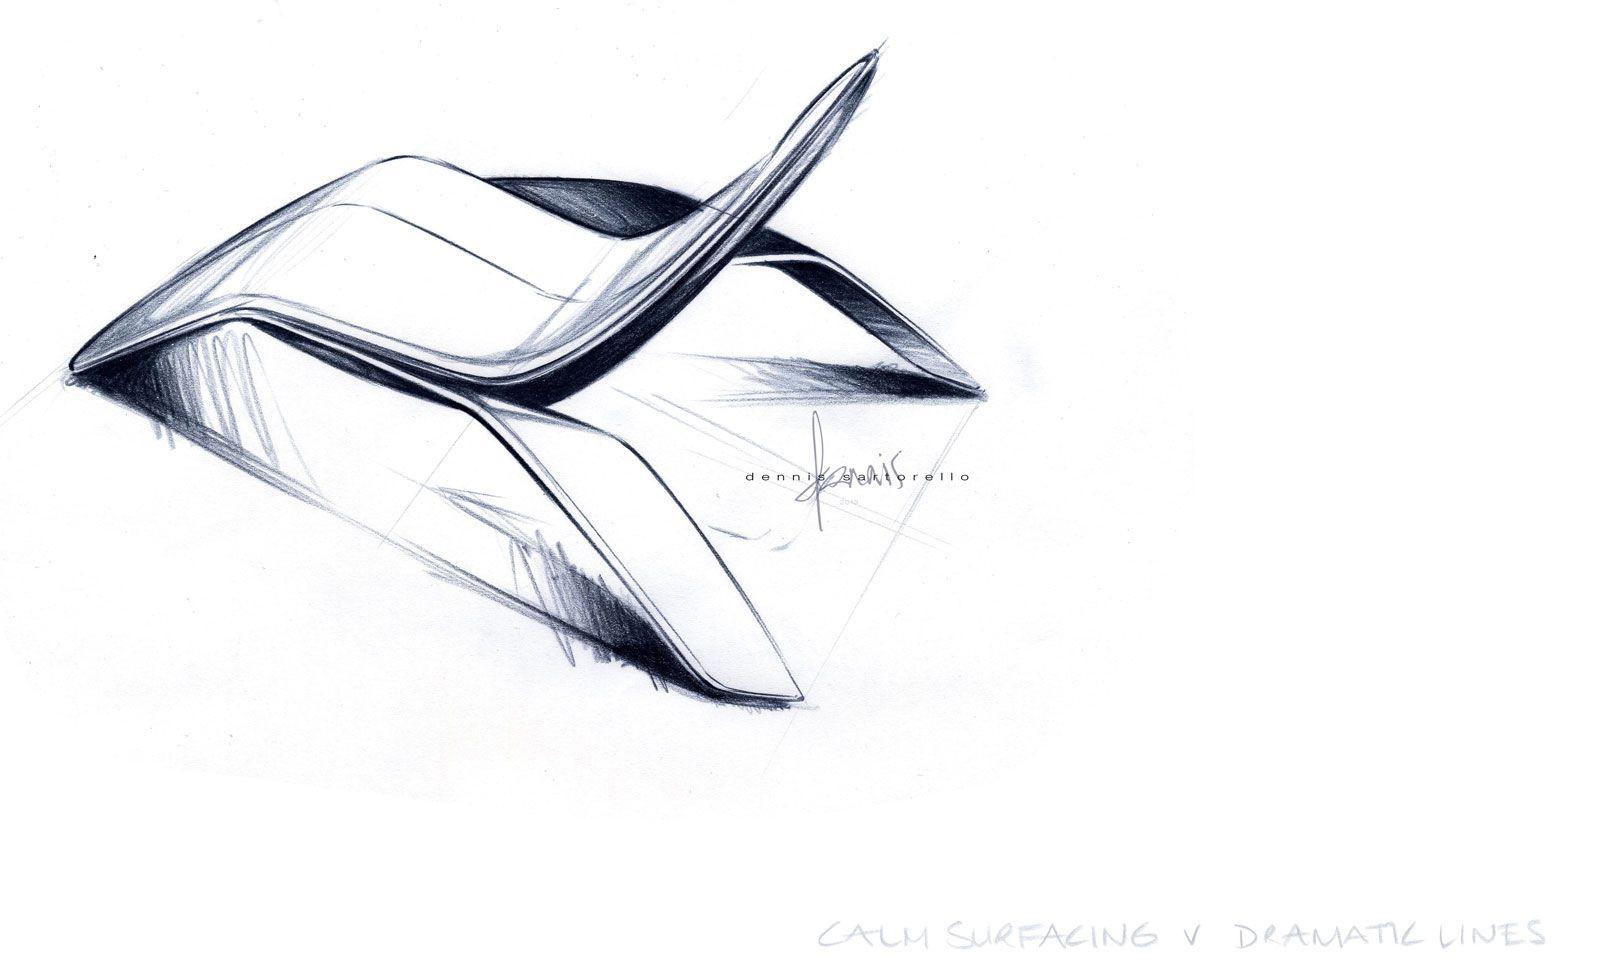 Industrial design sketches furniture - Ford Design Lounge Chair Design Sketch